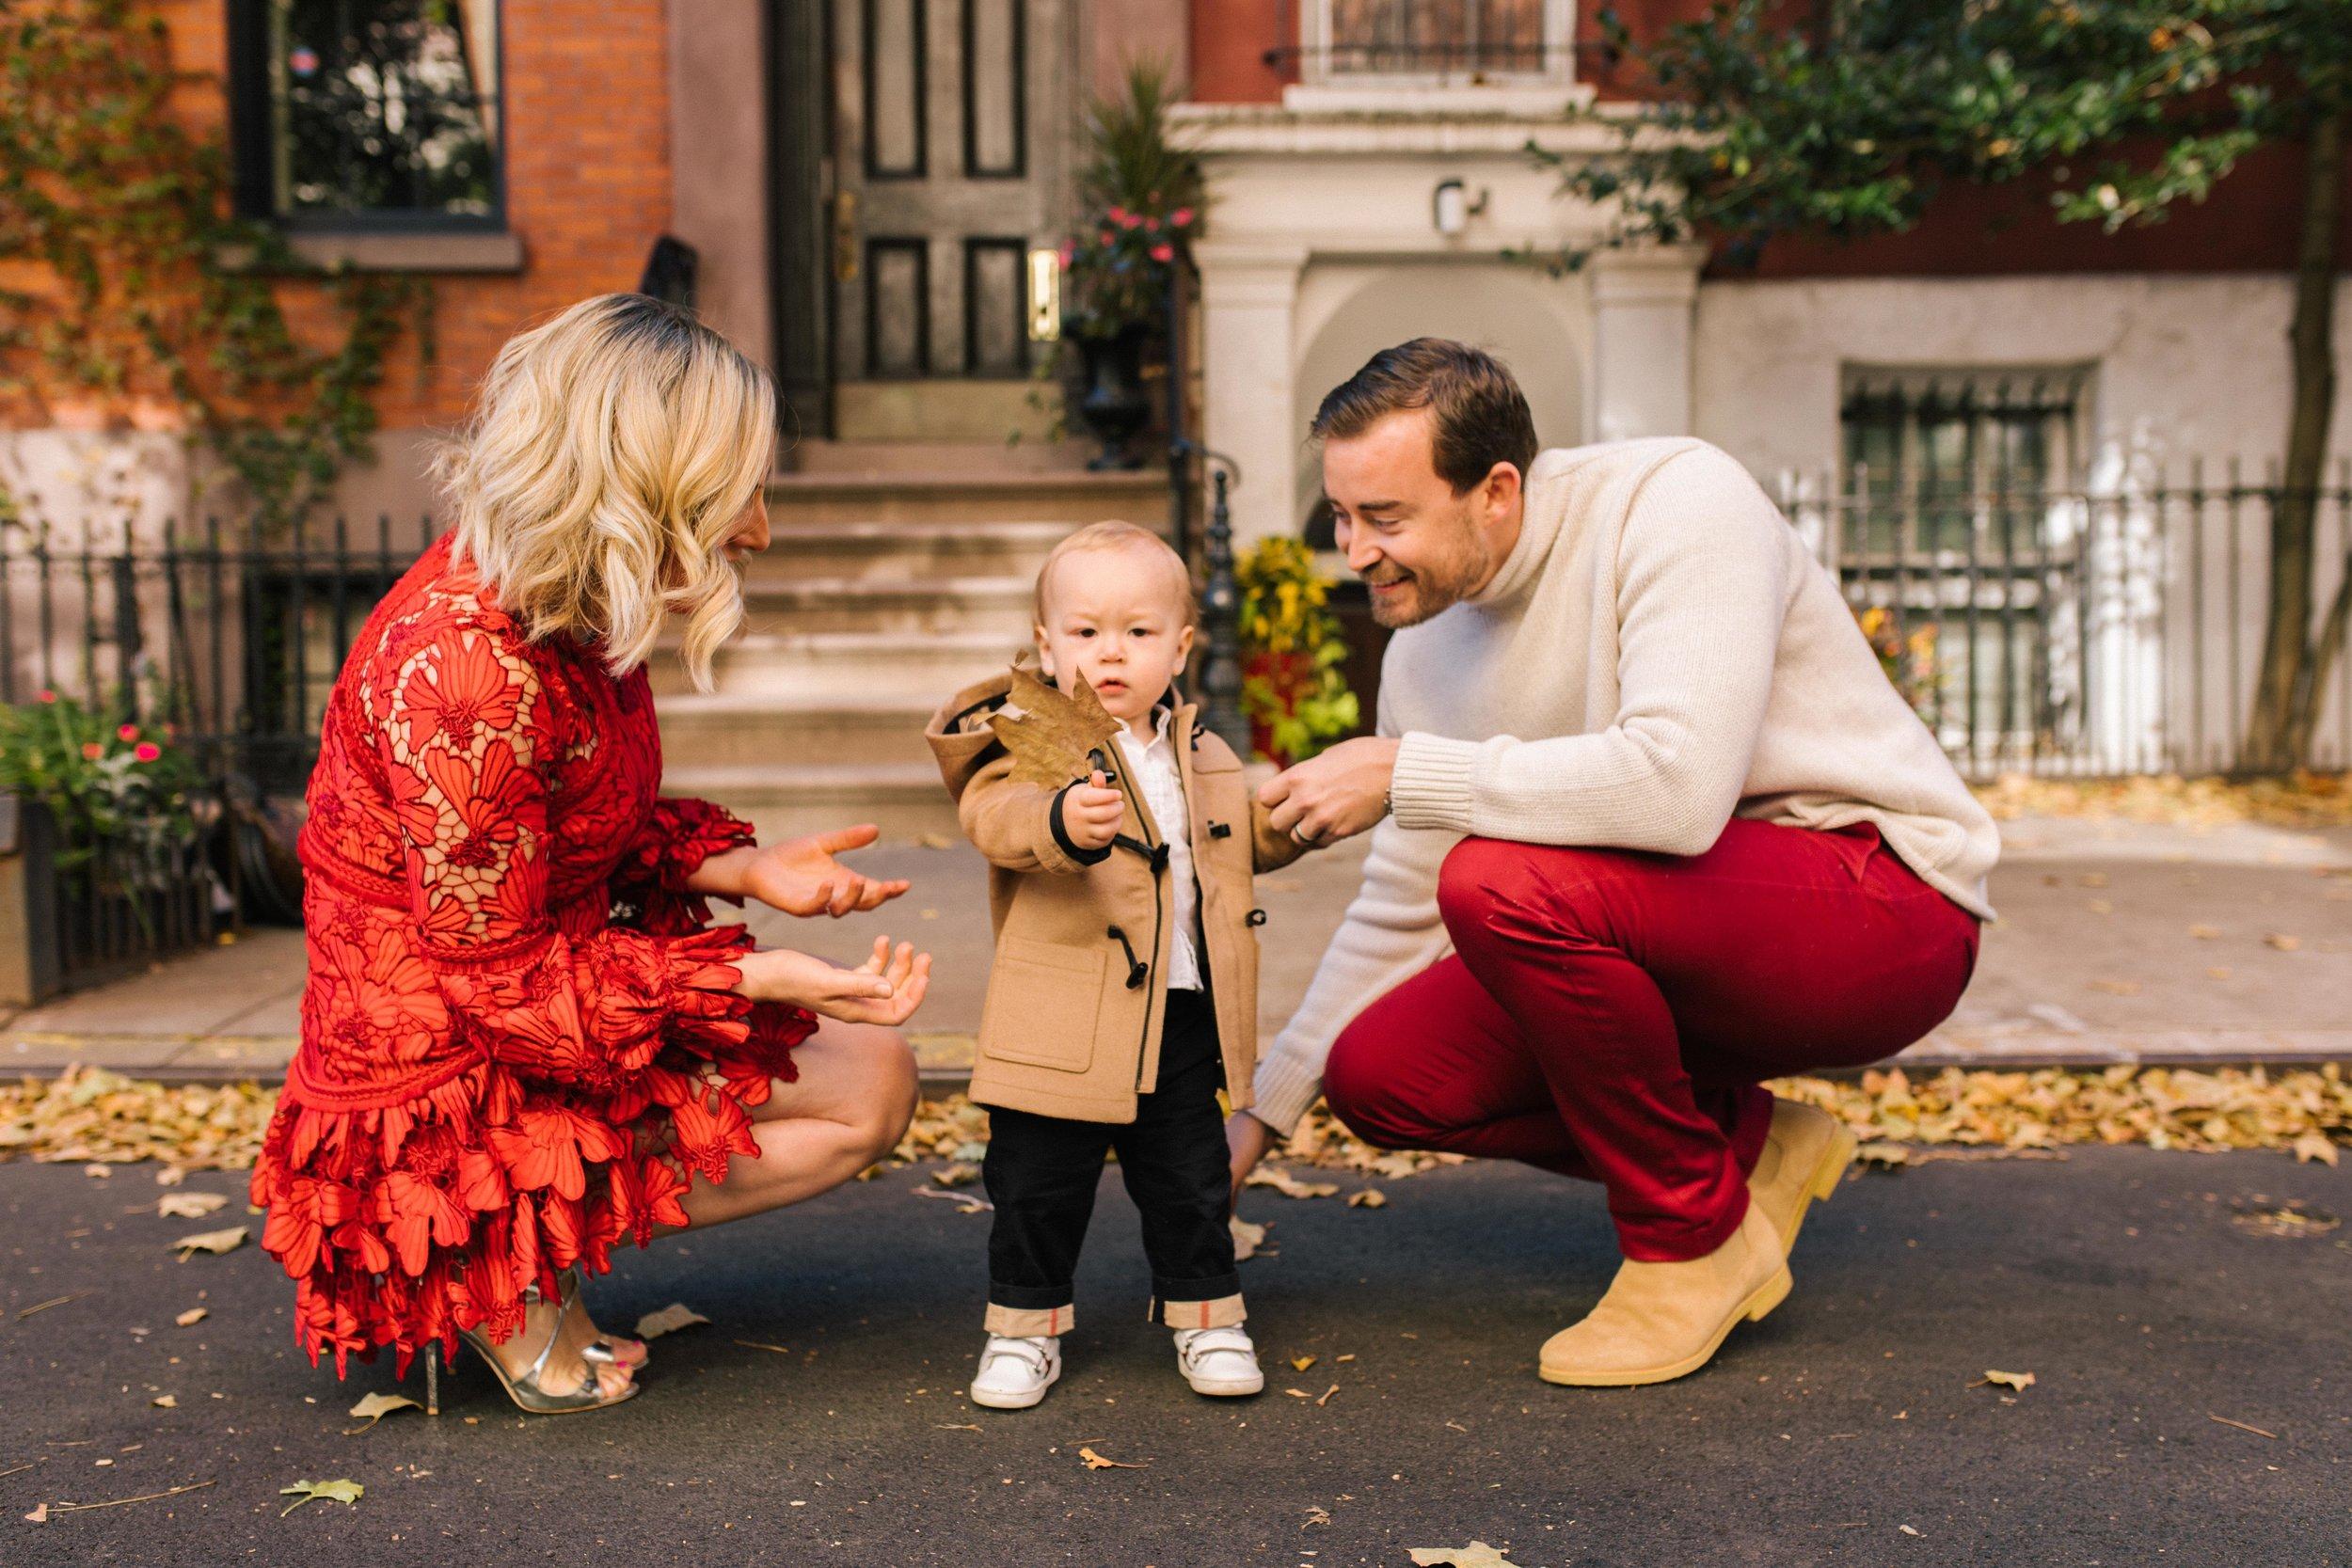 new_york_city_family_portrait_photographer (10 of 25).jpg